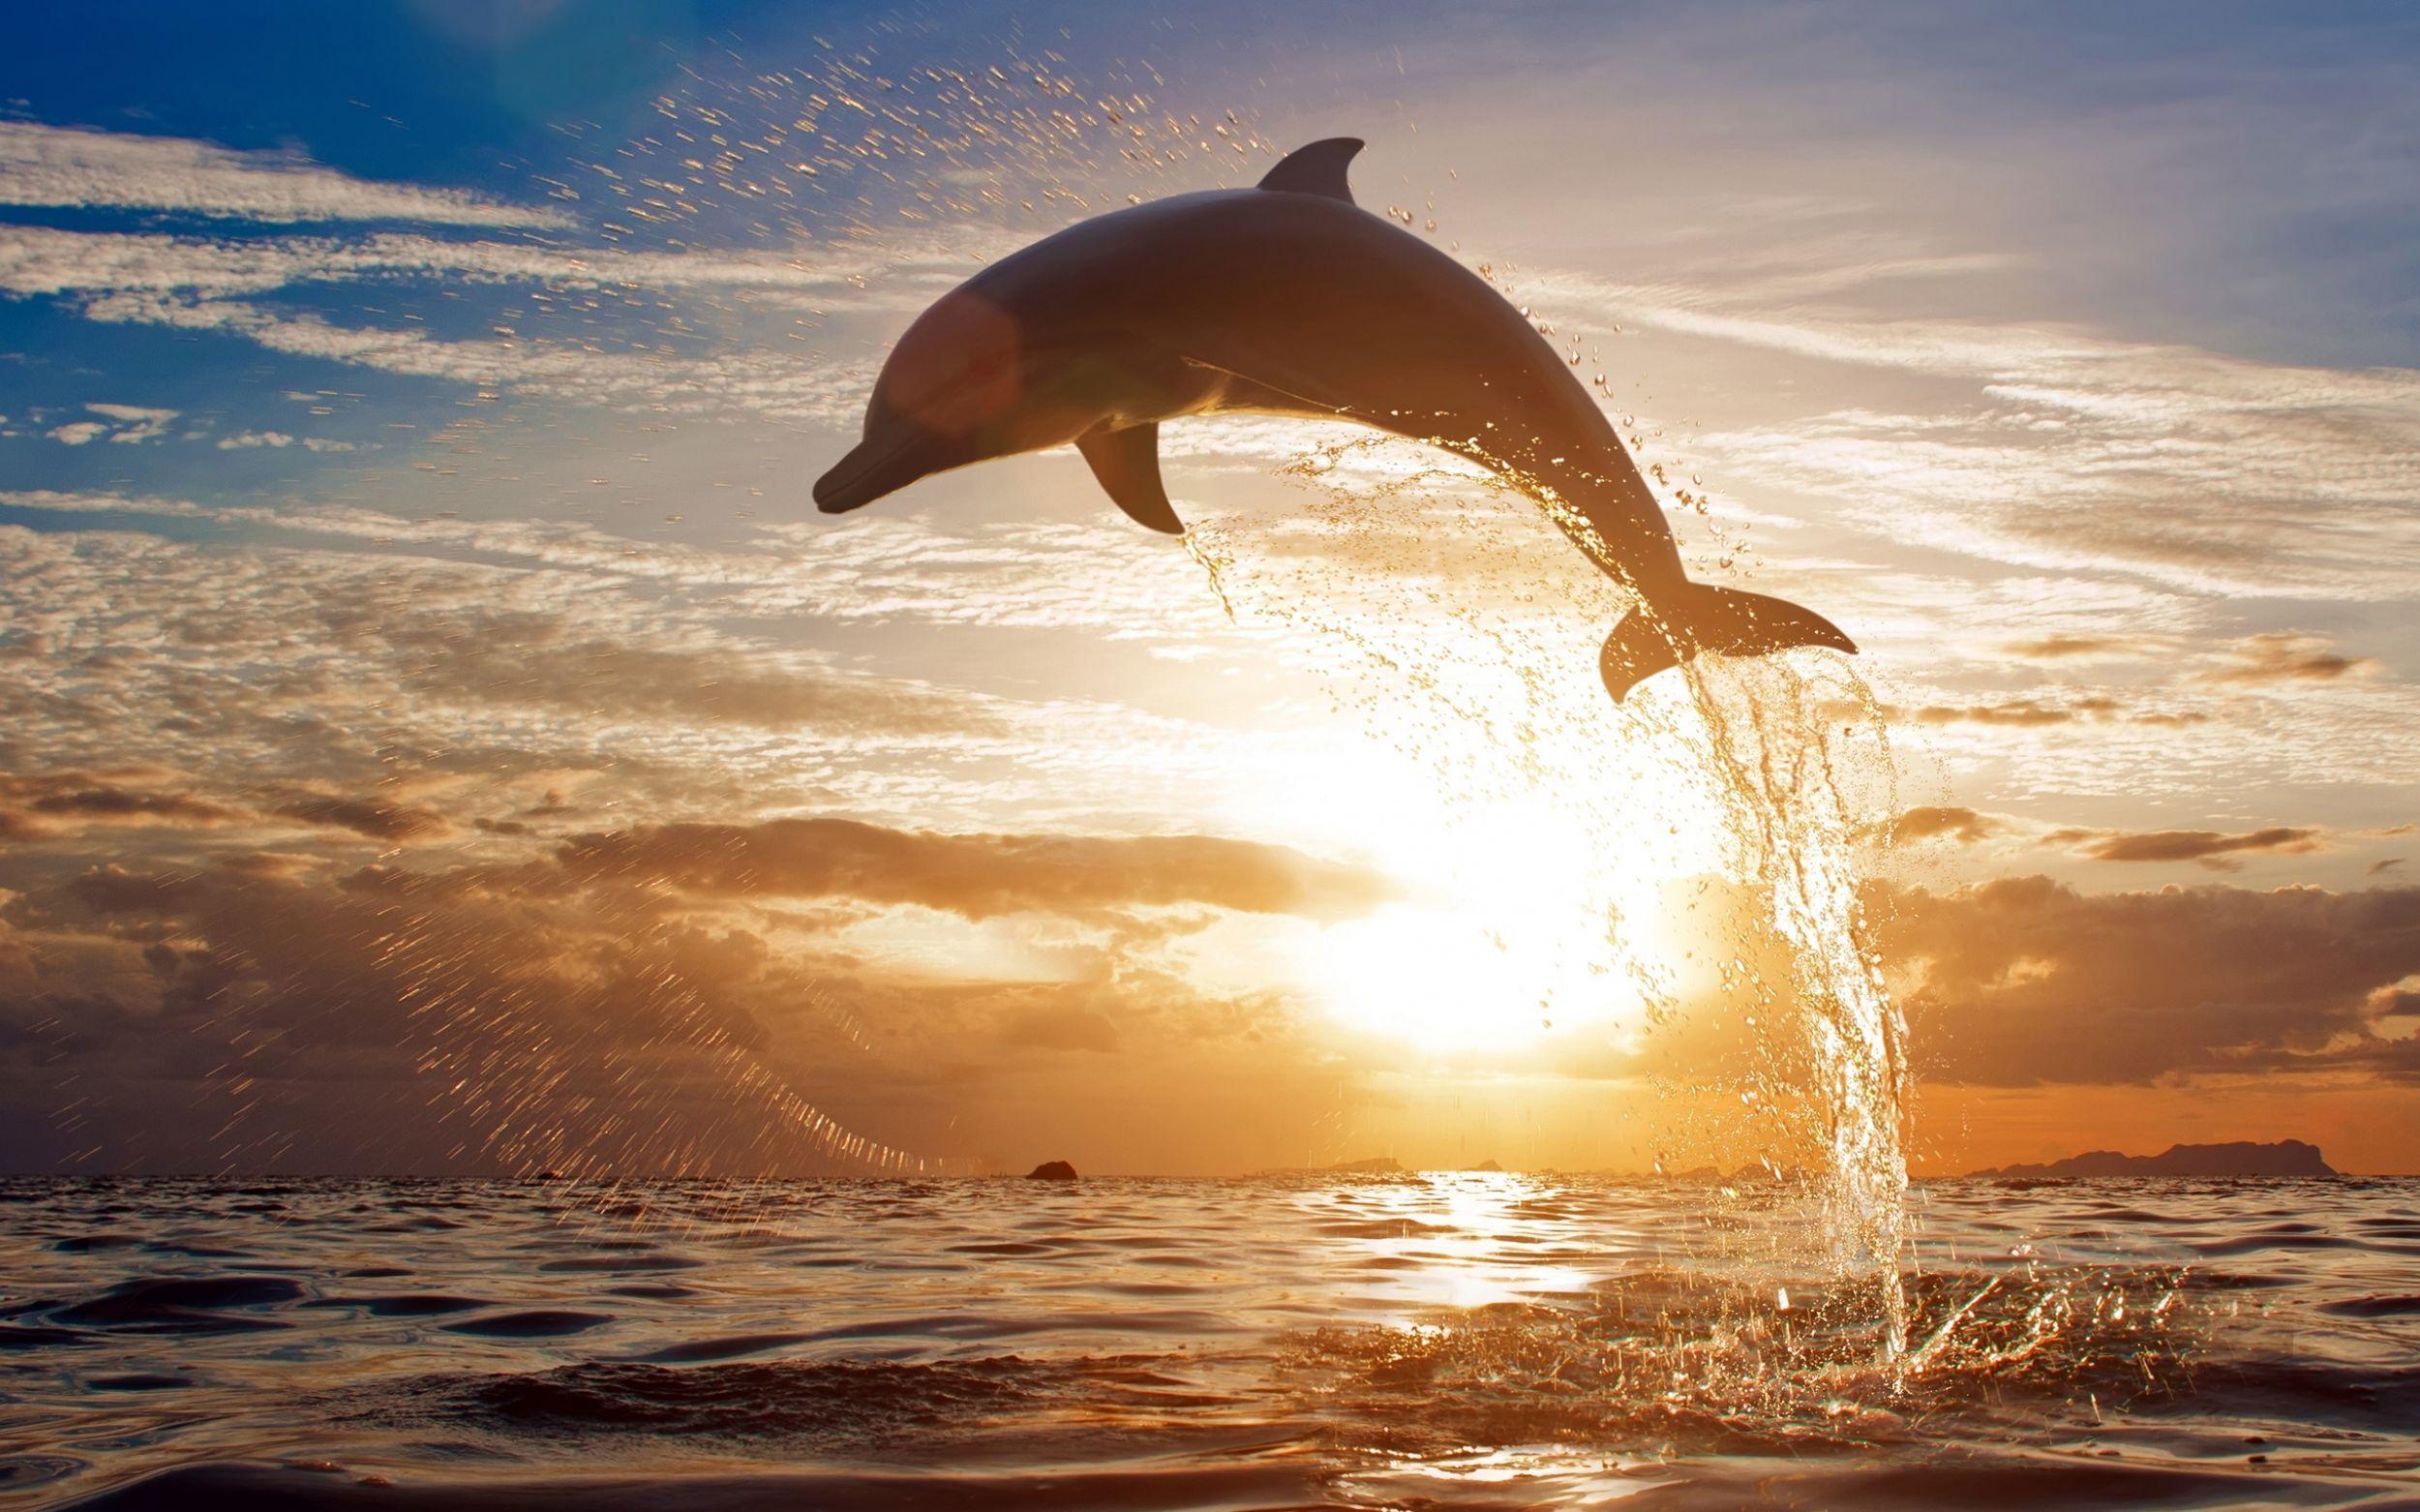 Dolphins Backgrounds download in digitalimagemakerworldcom 2500x1562